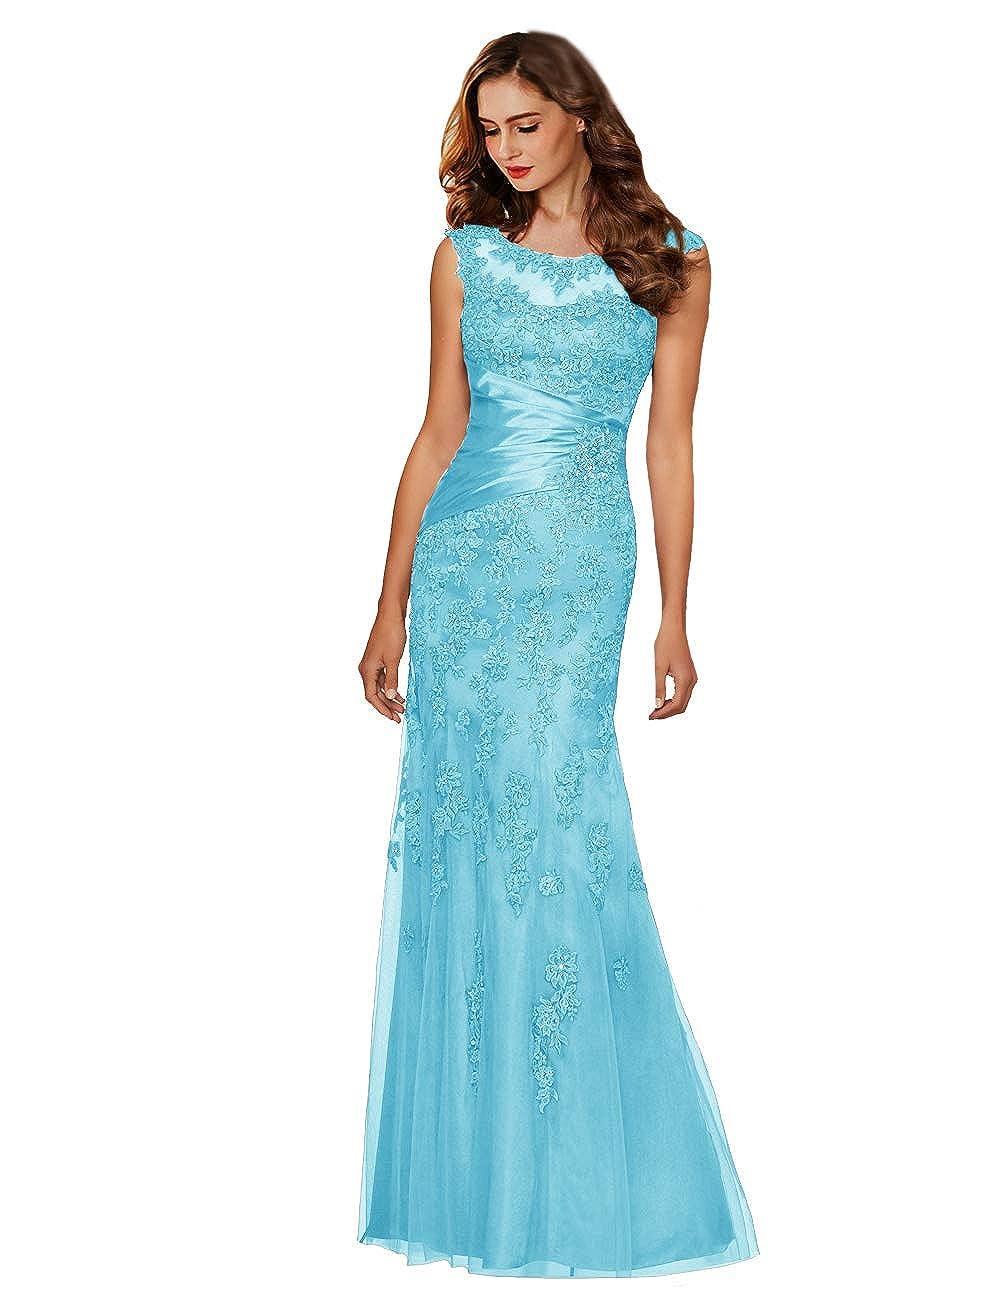 Light bluee CuteShe Women' Formal Gowns Long Evening Dresses for Weddings